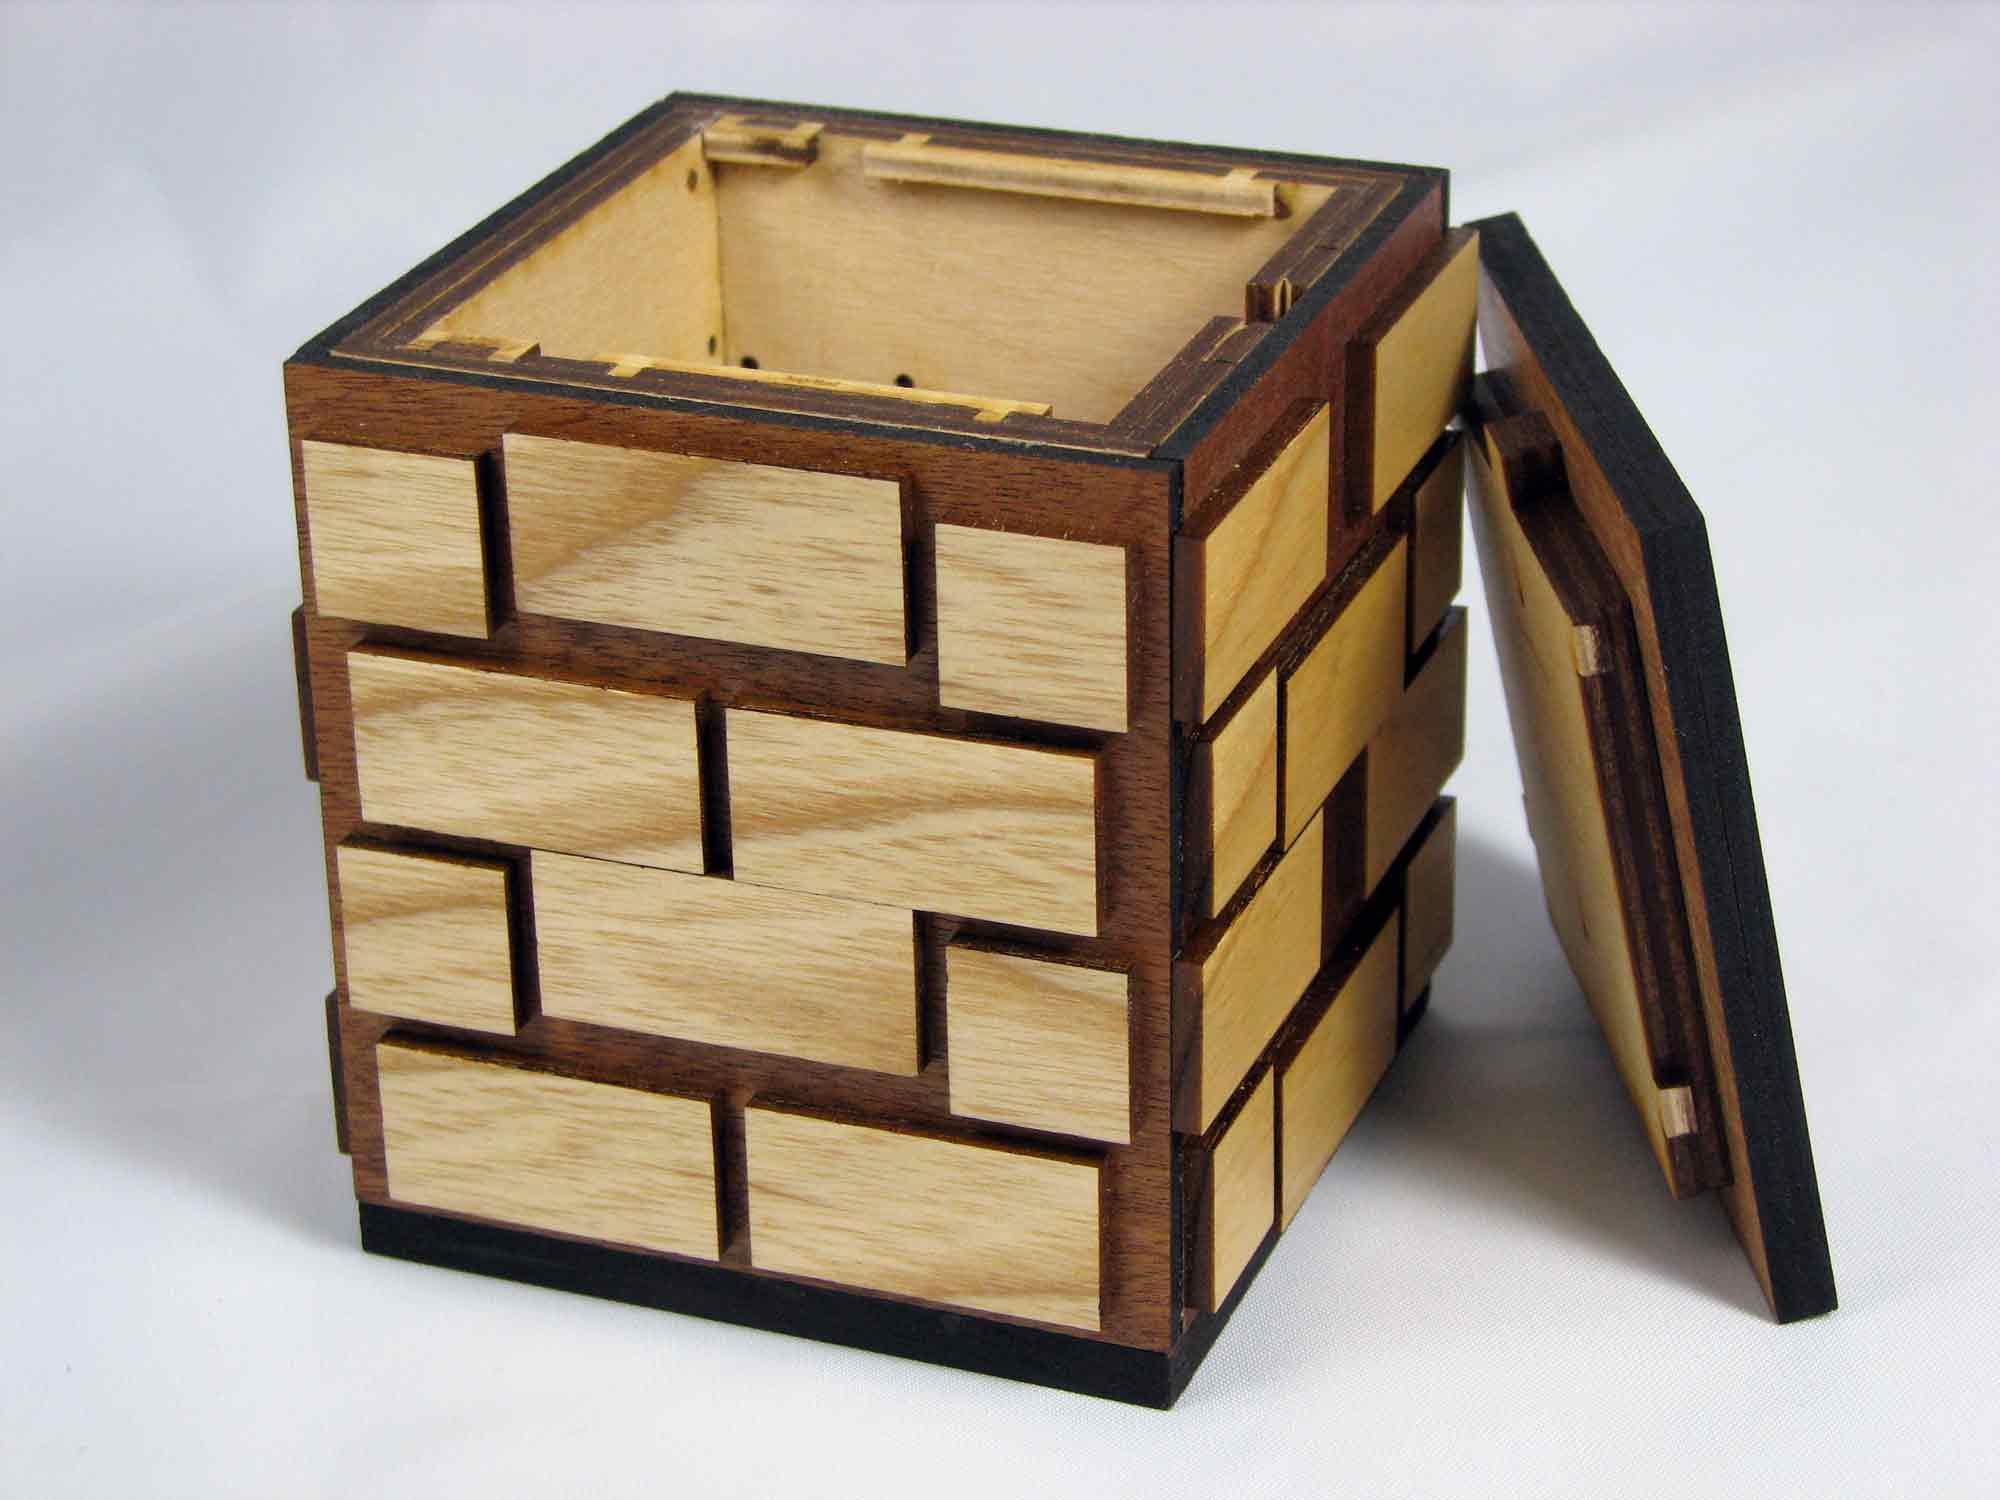 Brick Block Kit